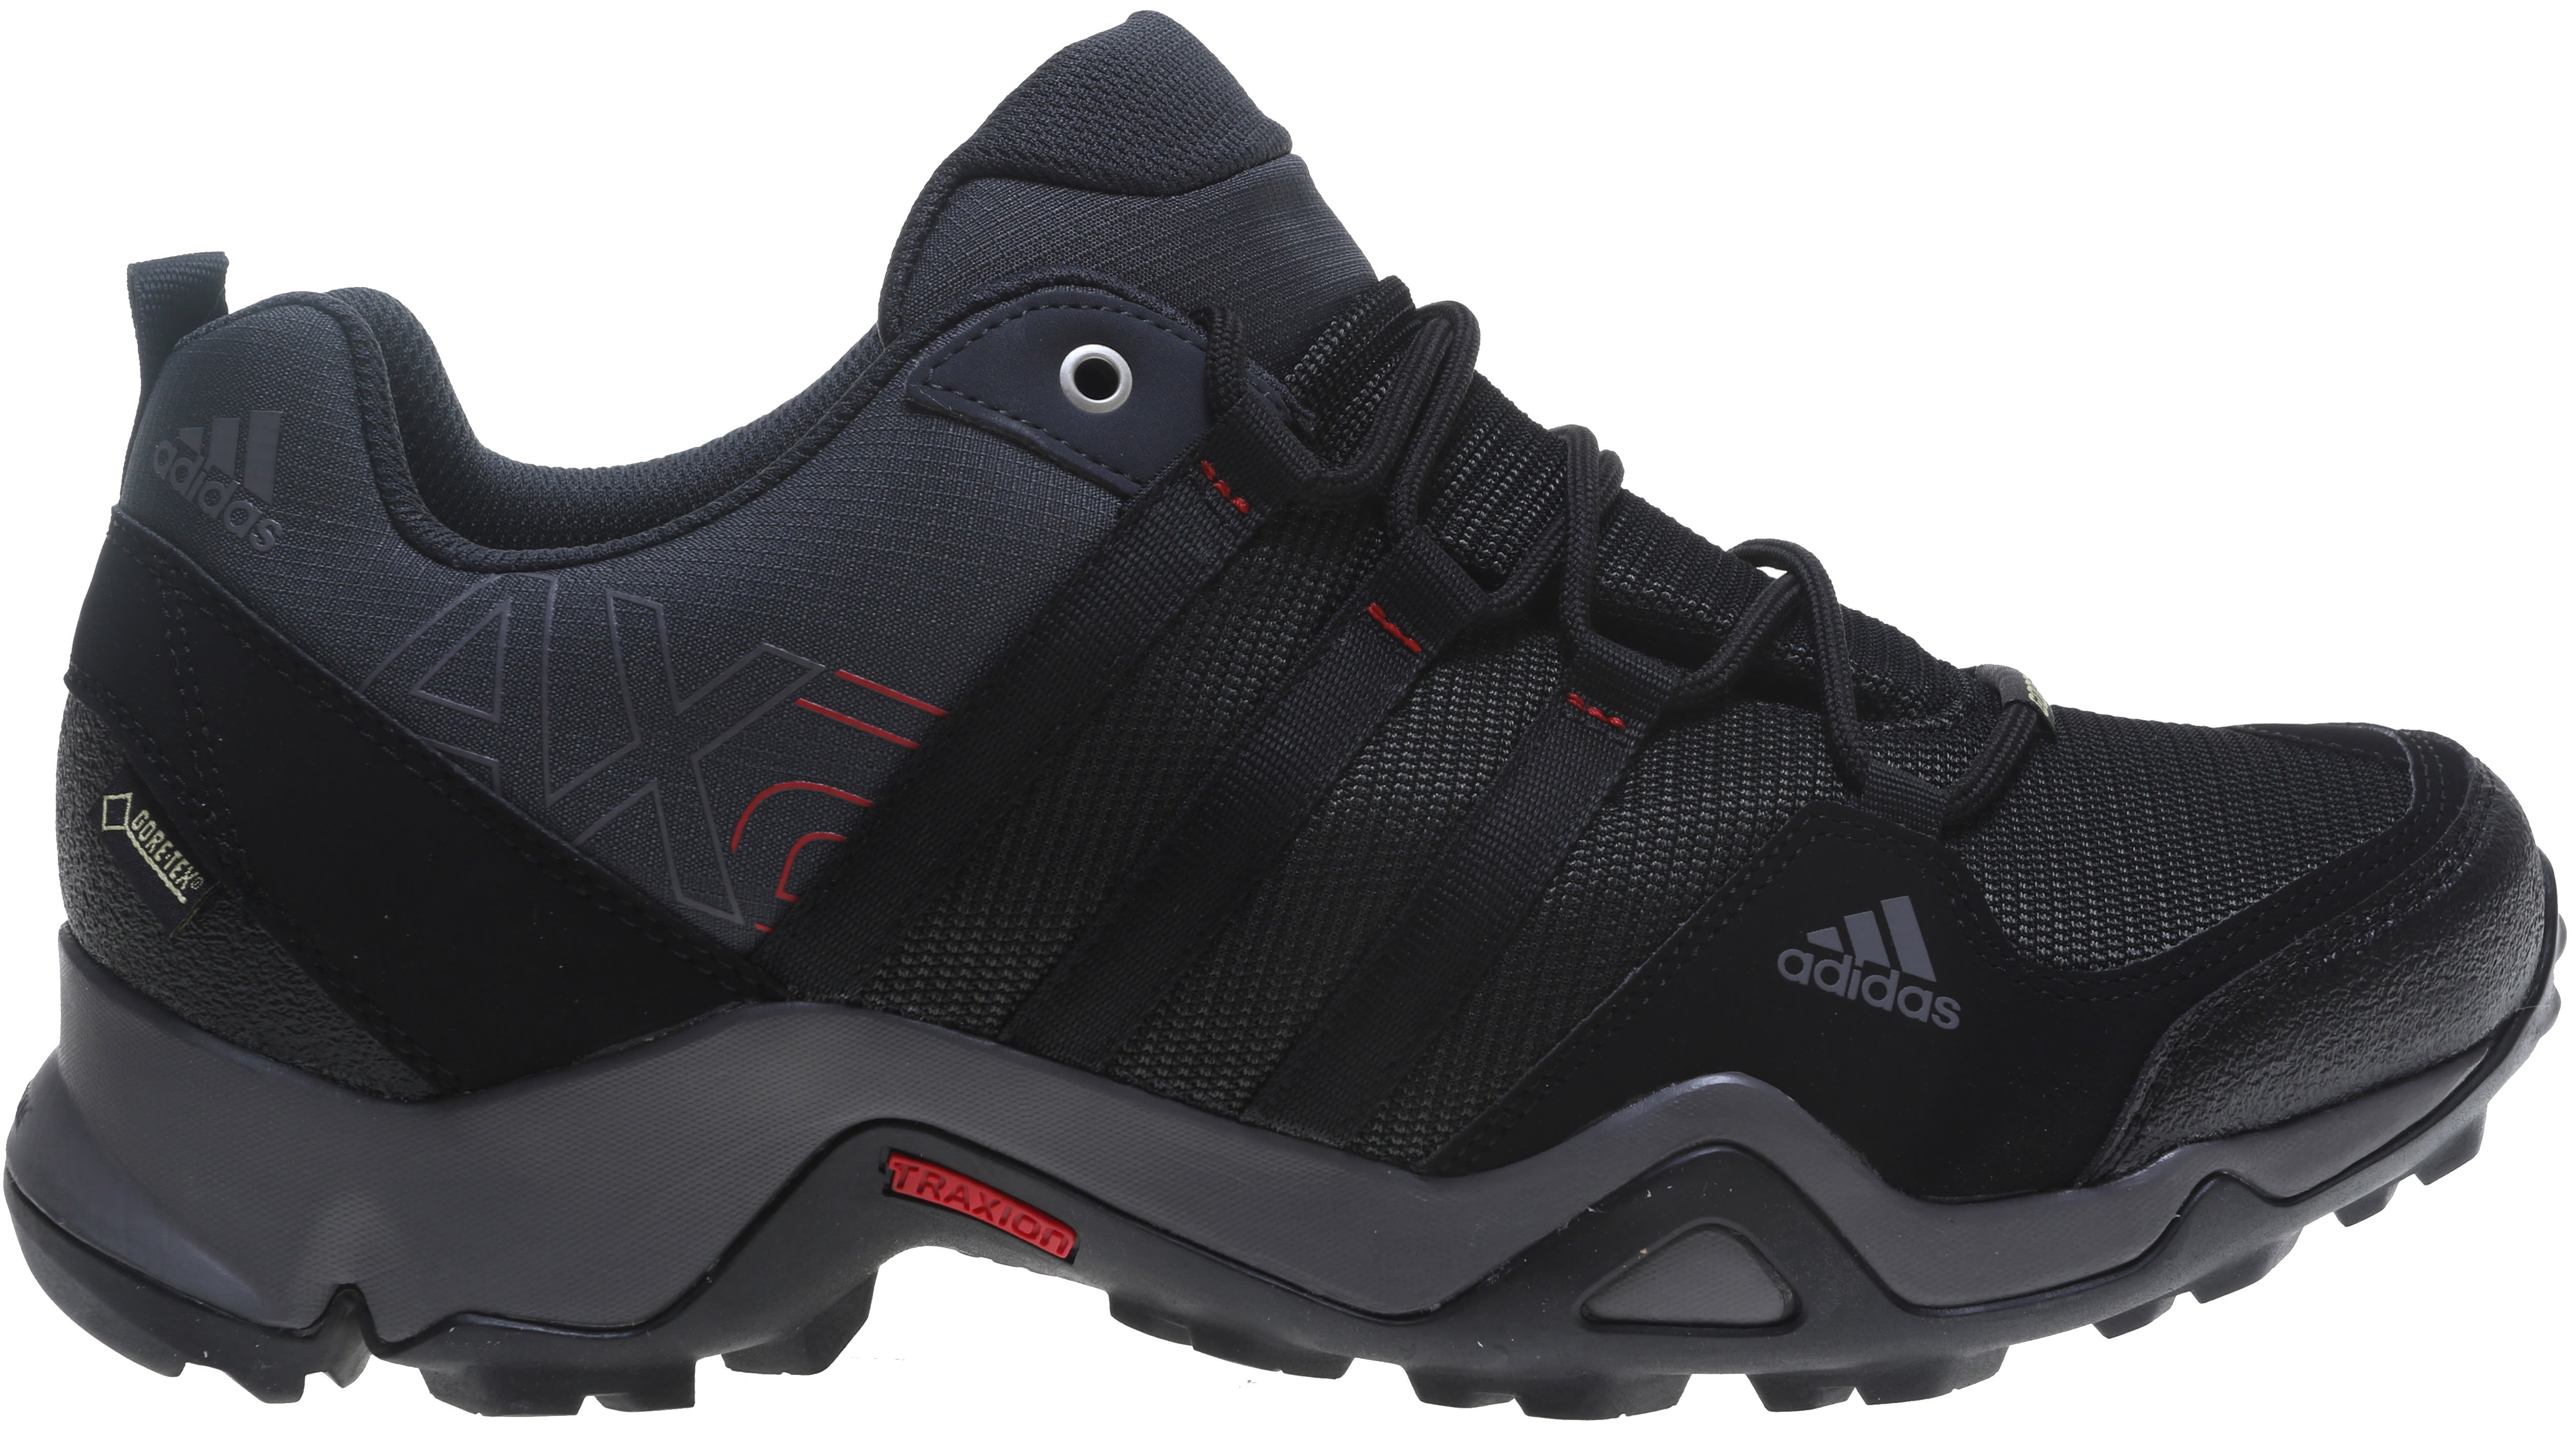 63317f6e10ef41 Adidas AX2 Gore-Tex Hiking Shoes - thumbnail 1